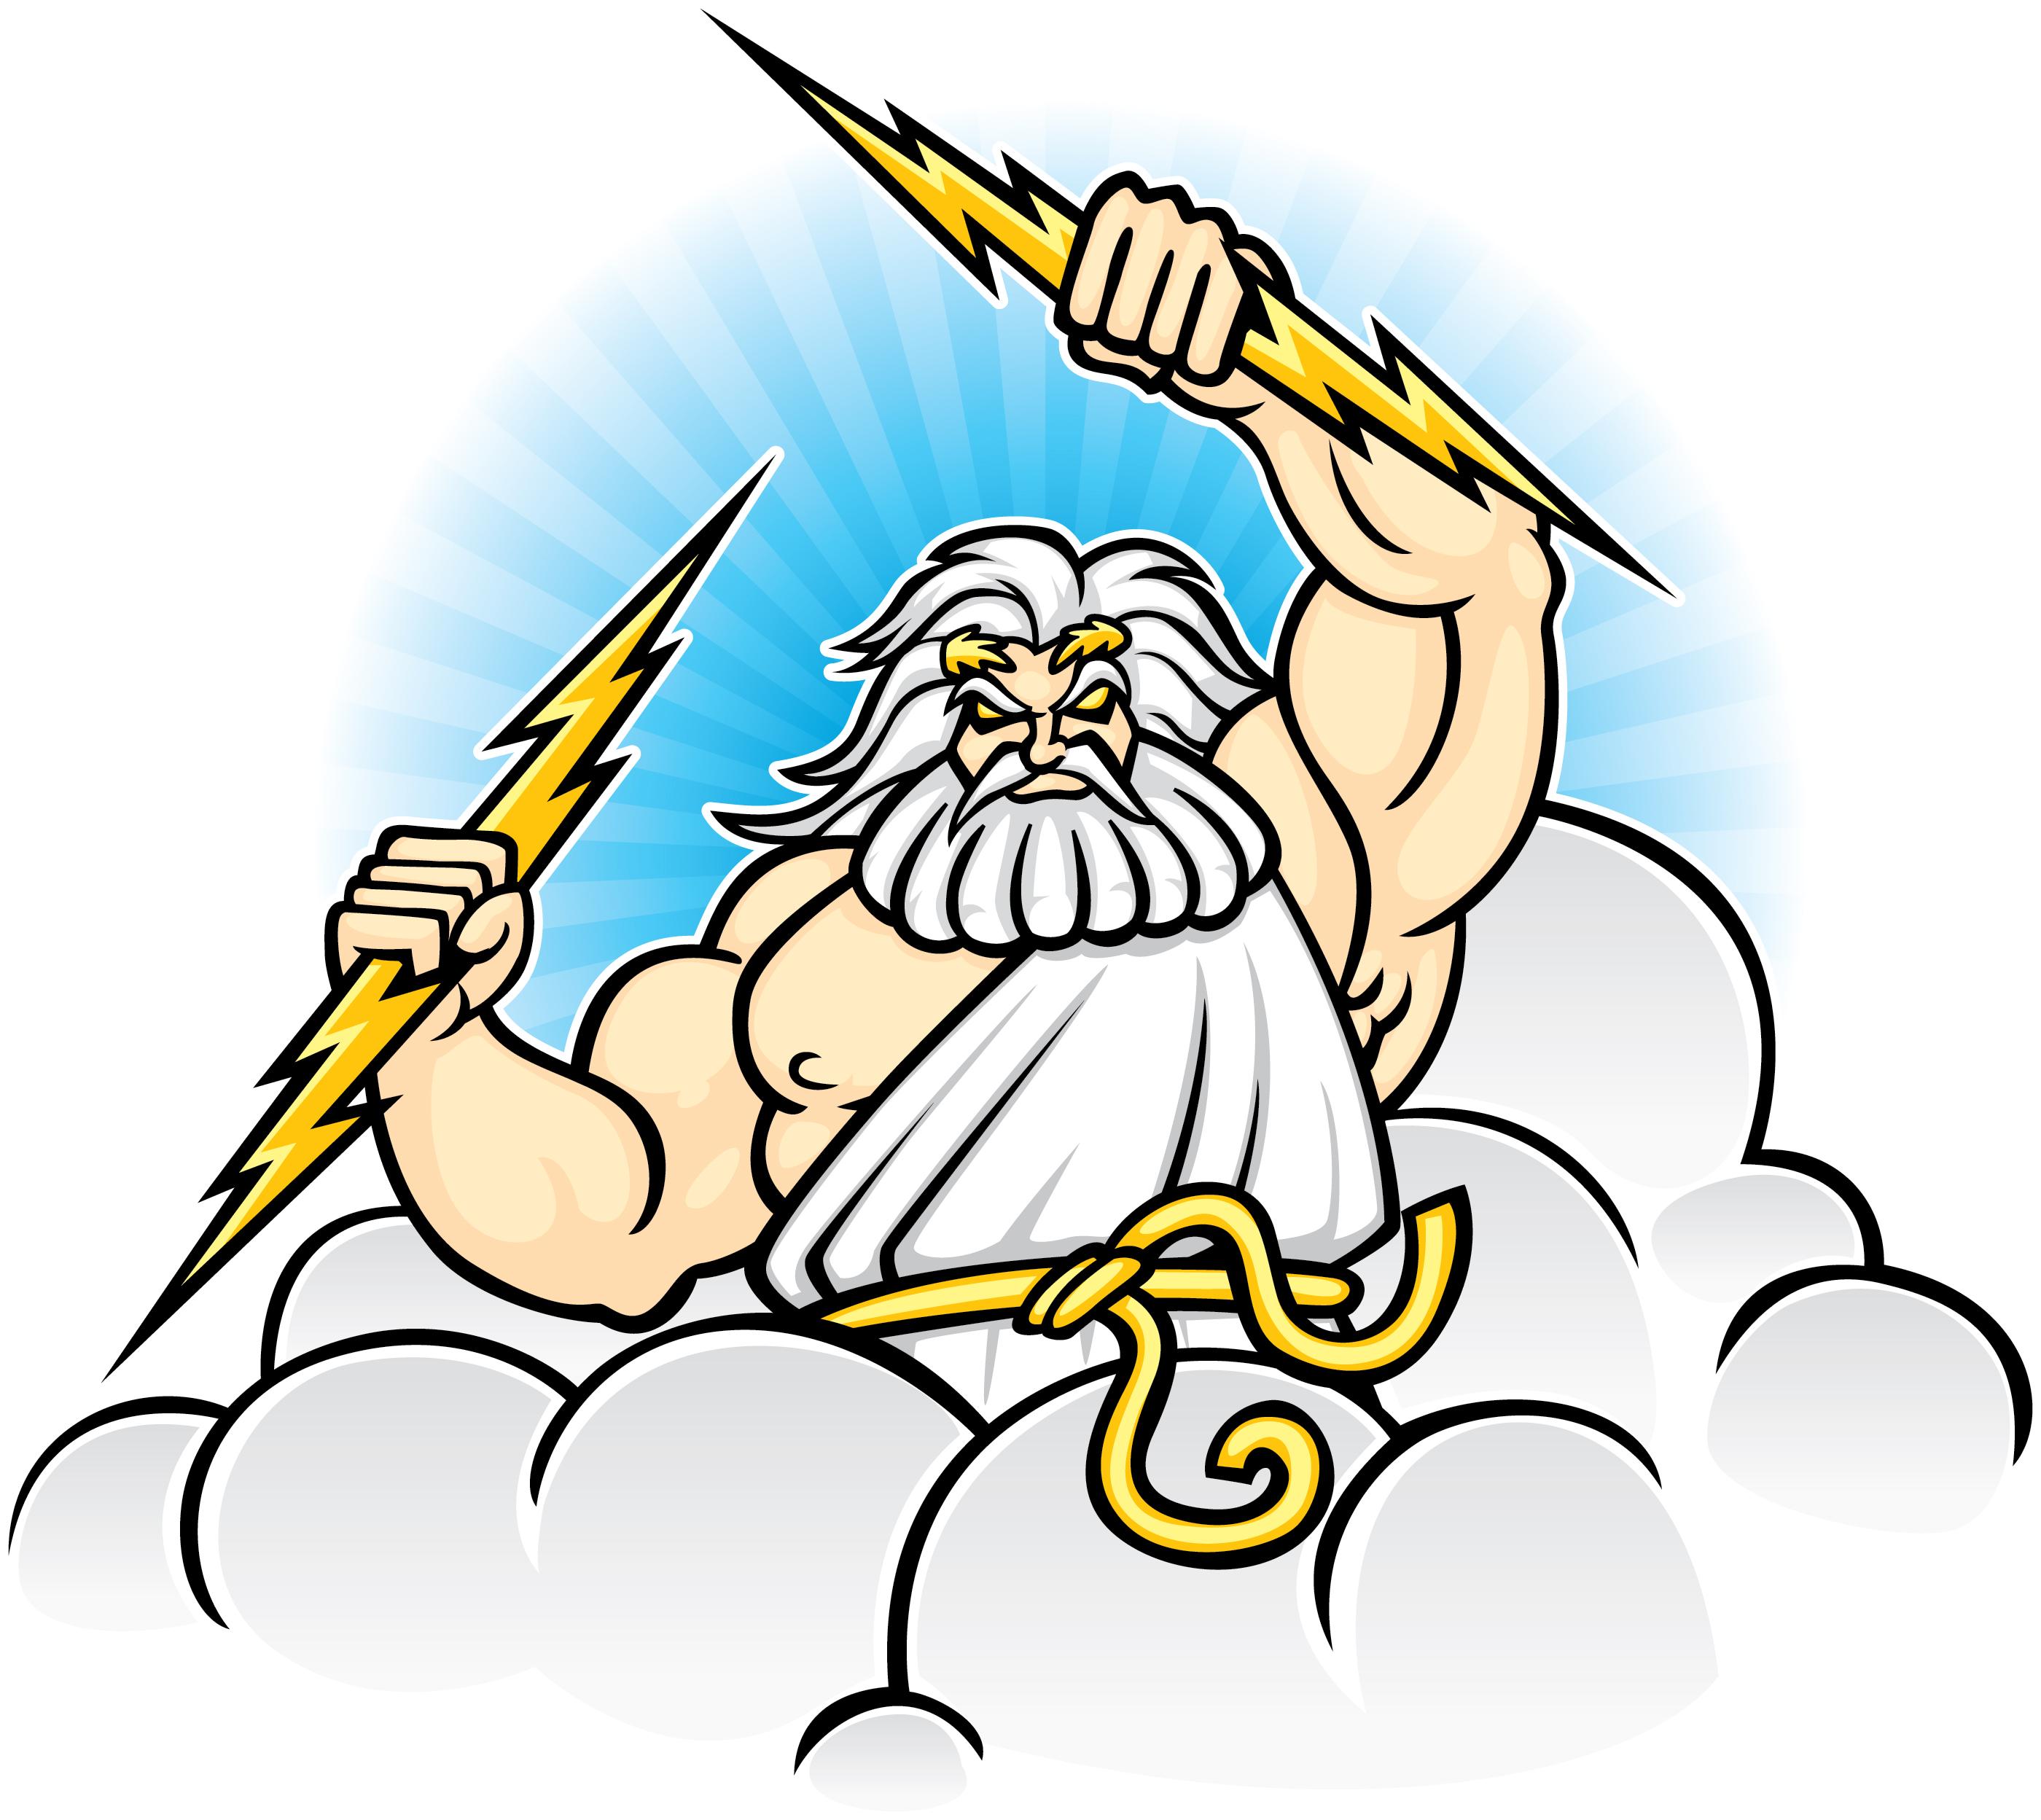 Zeus god clipart svg freeuse stock Free Zeus Cliparts, Download Free Clip Art, Free Clip Art on ... svg freeuse stock